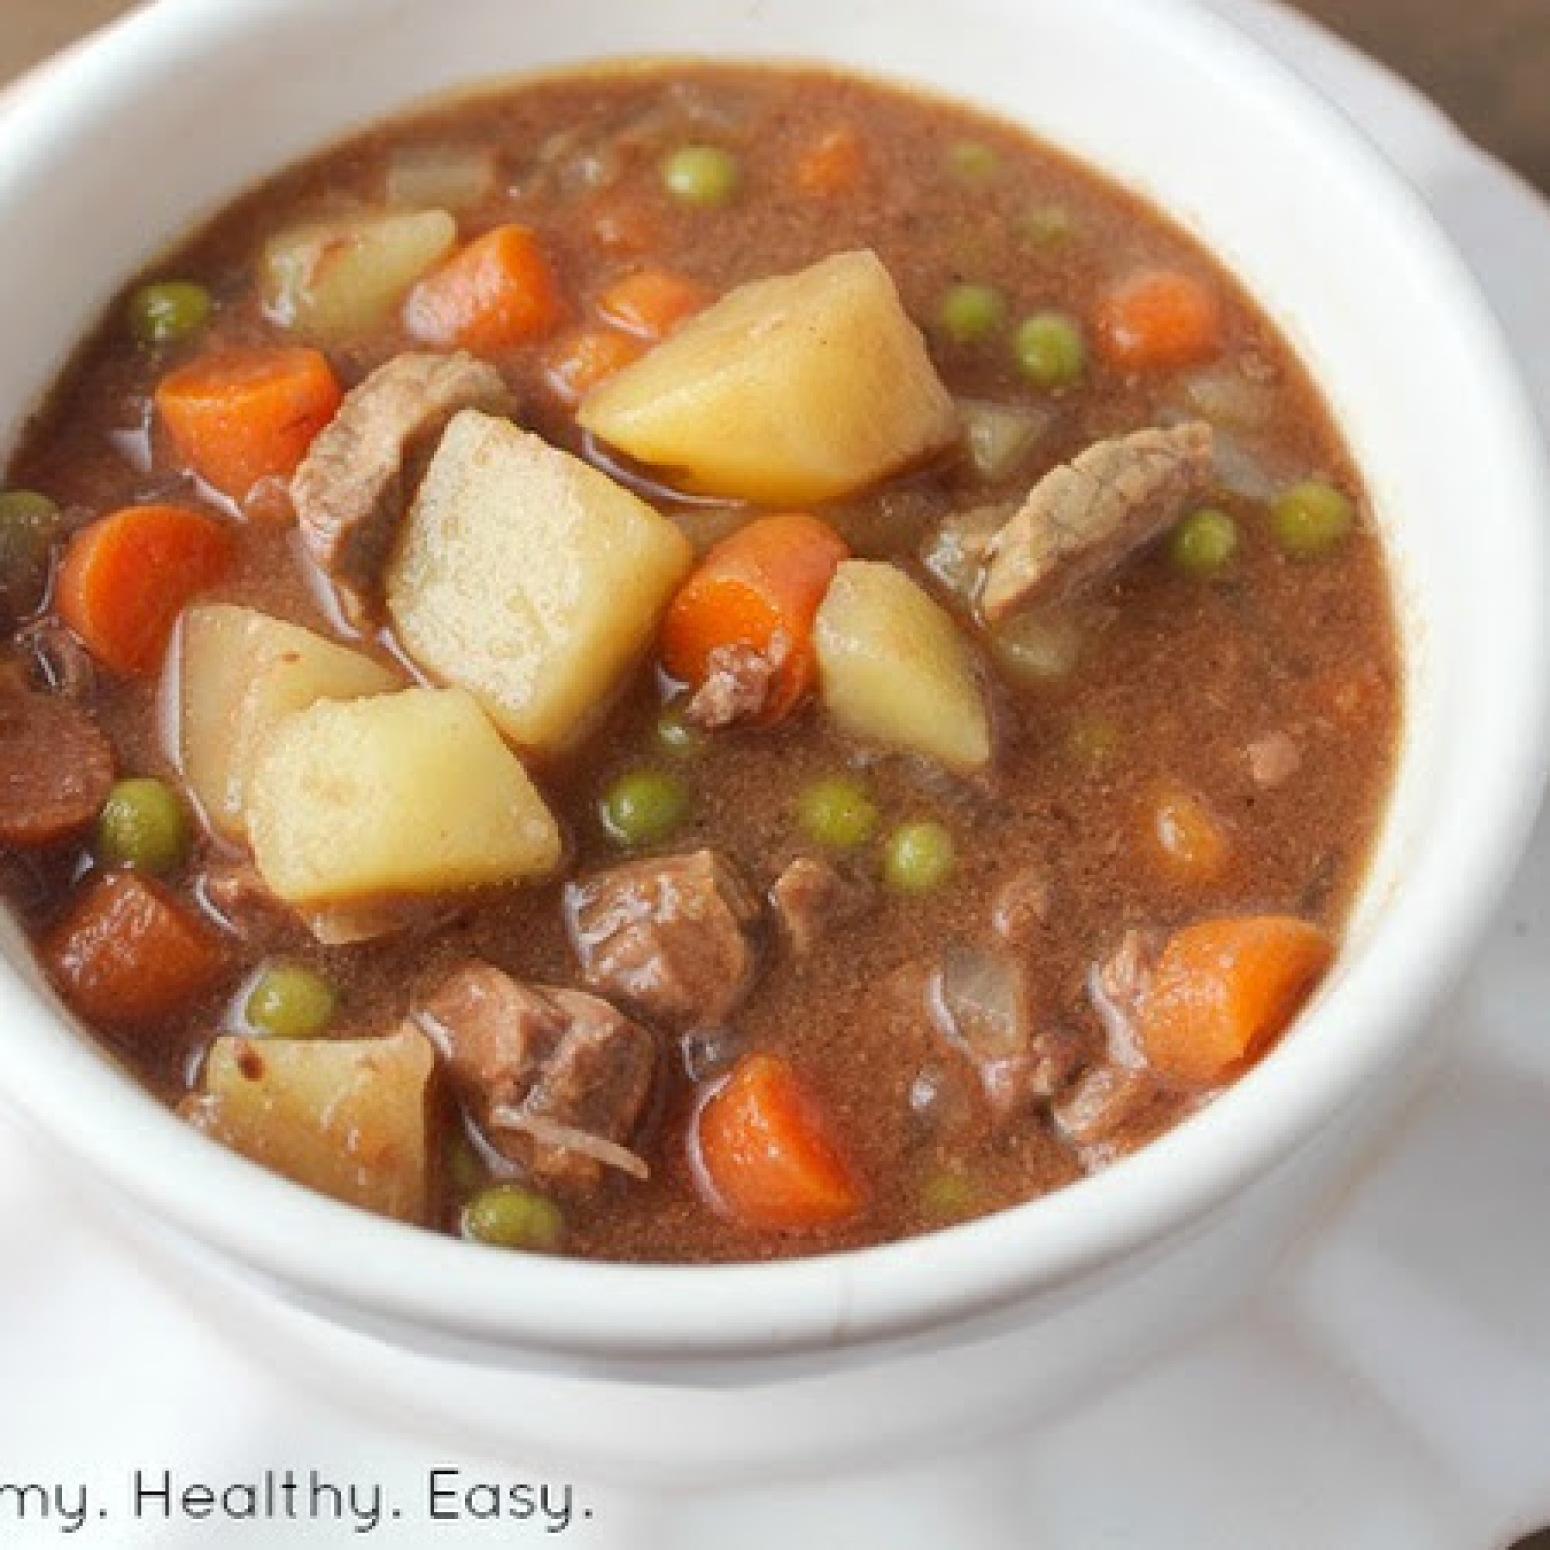 Simple Crock Pot Beef Stew Recipe | Just A Pinch Recipes